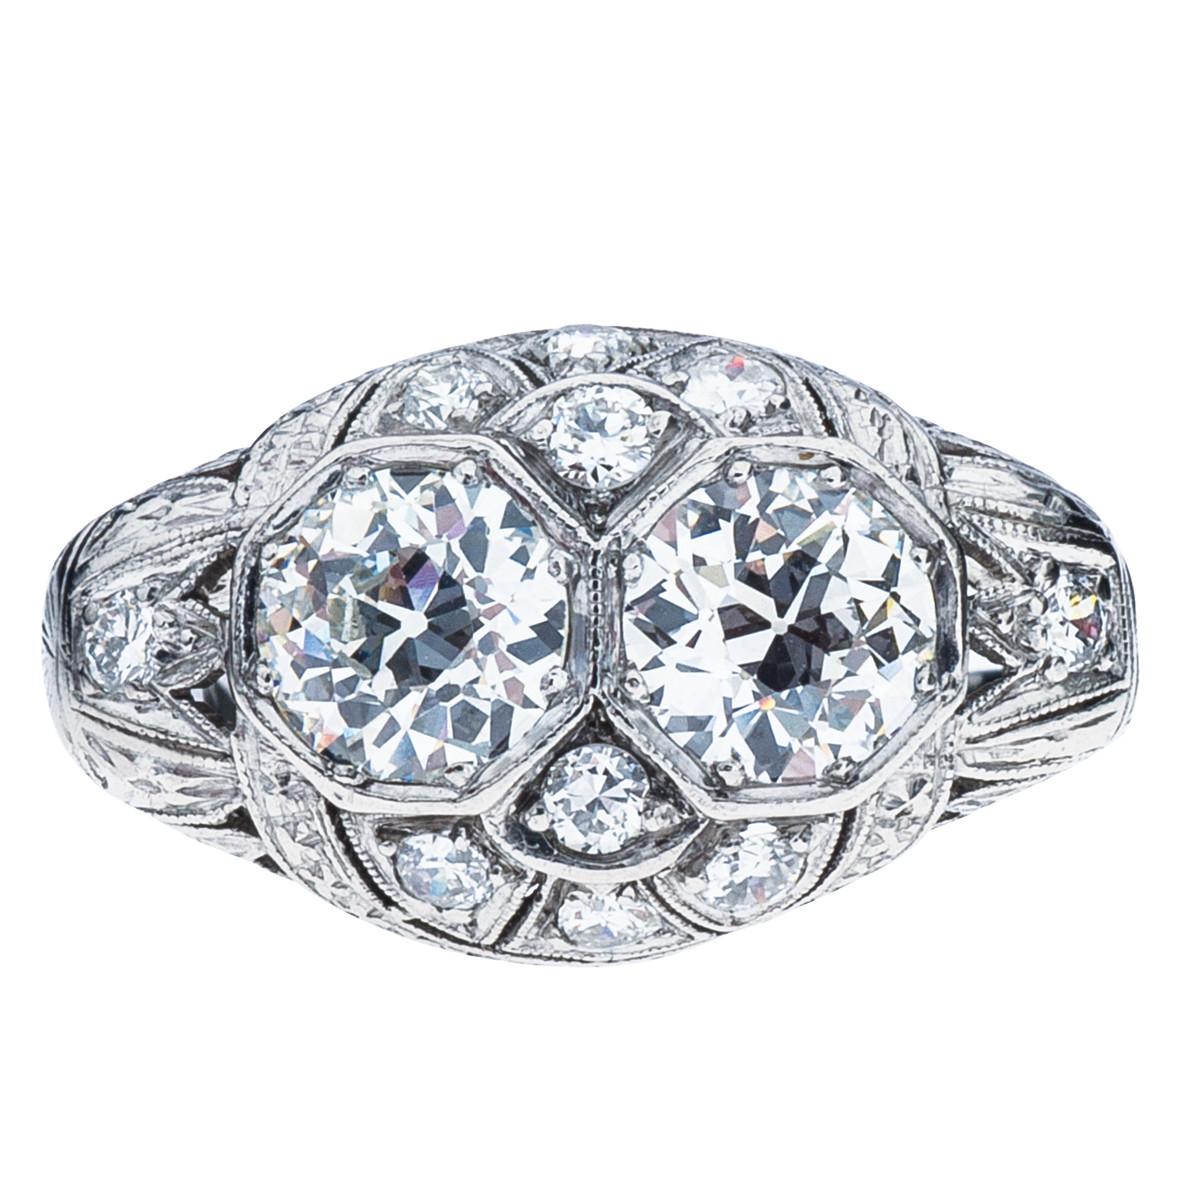 Antique Edwardian 1.62 CTW Diamond Ring